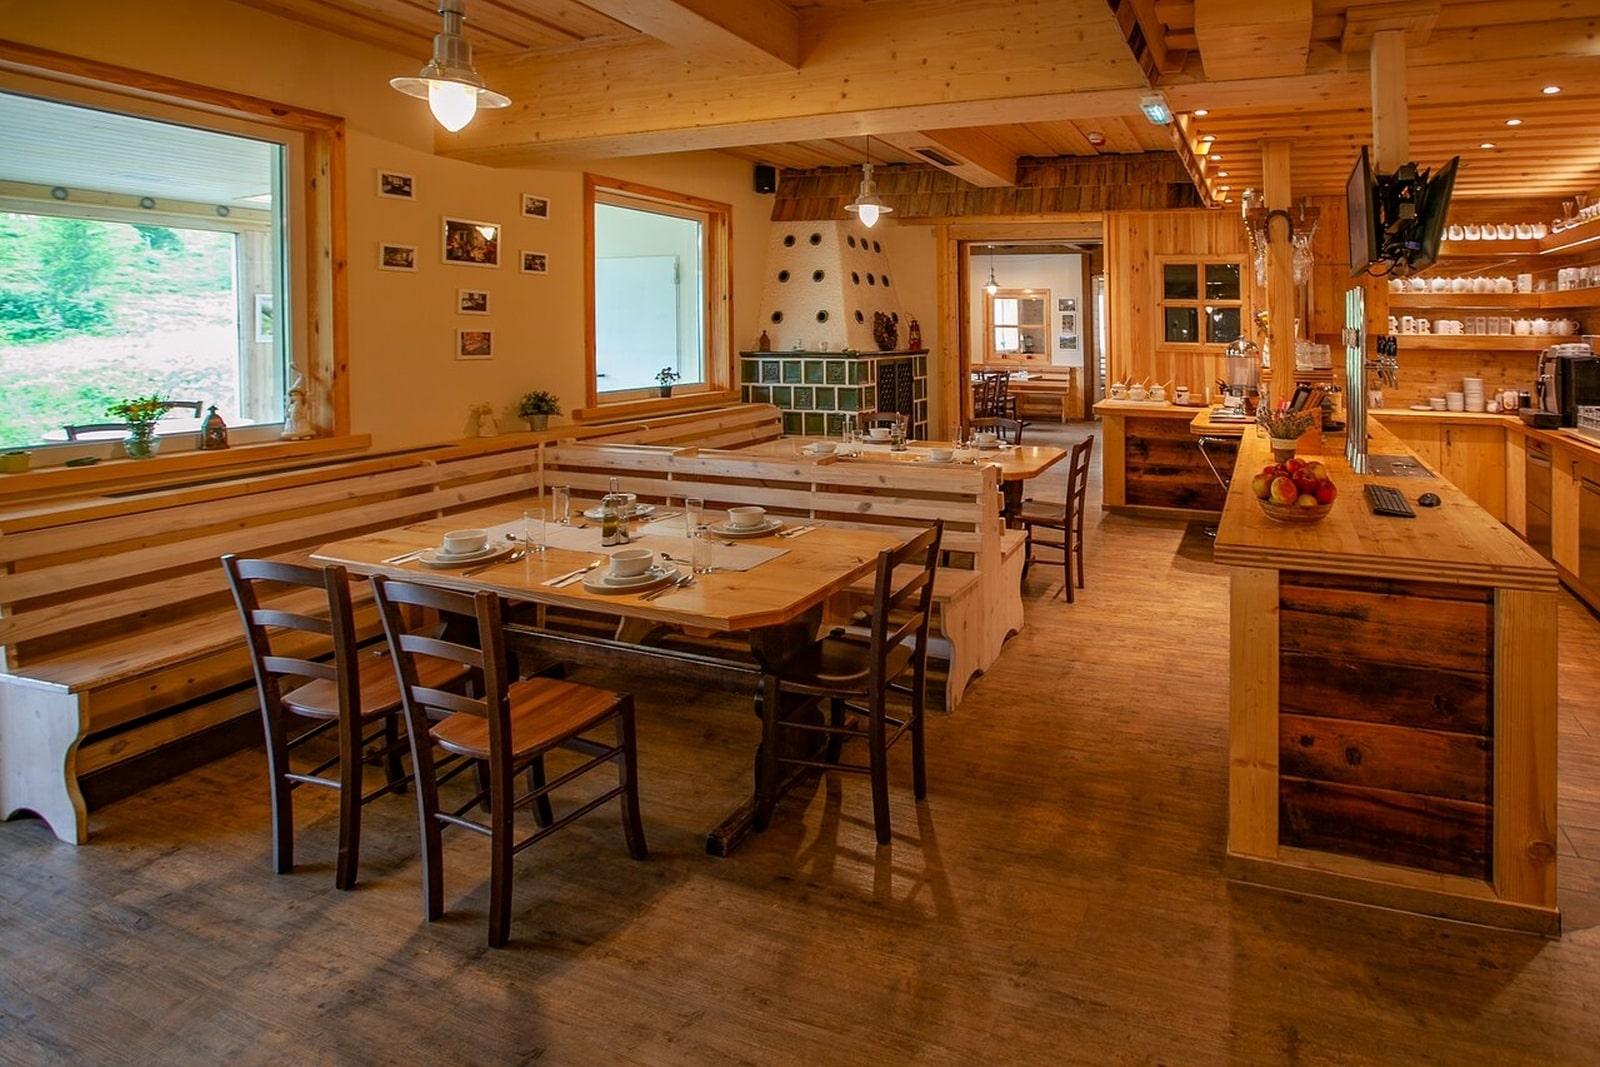 Heidi-Chalet-Falkert-Heidialm-Restaurant-Falkert-Schneekoenig-Innen